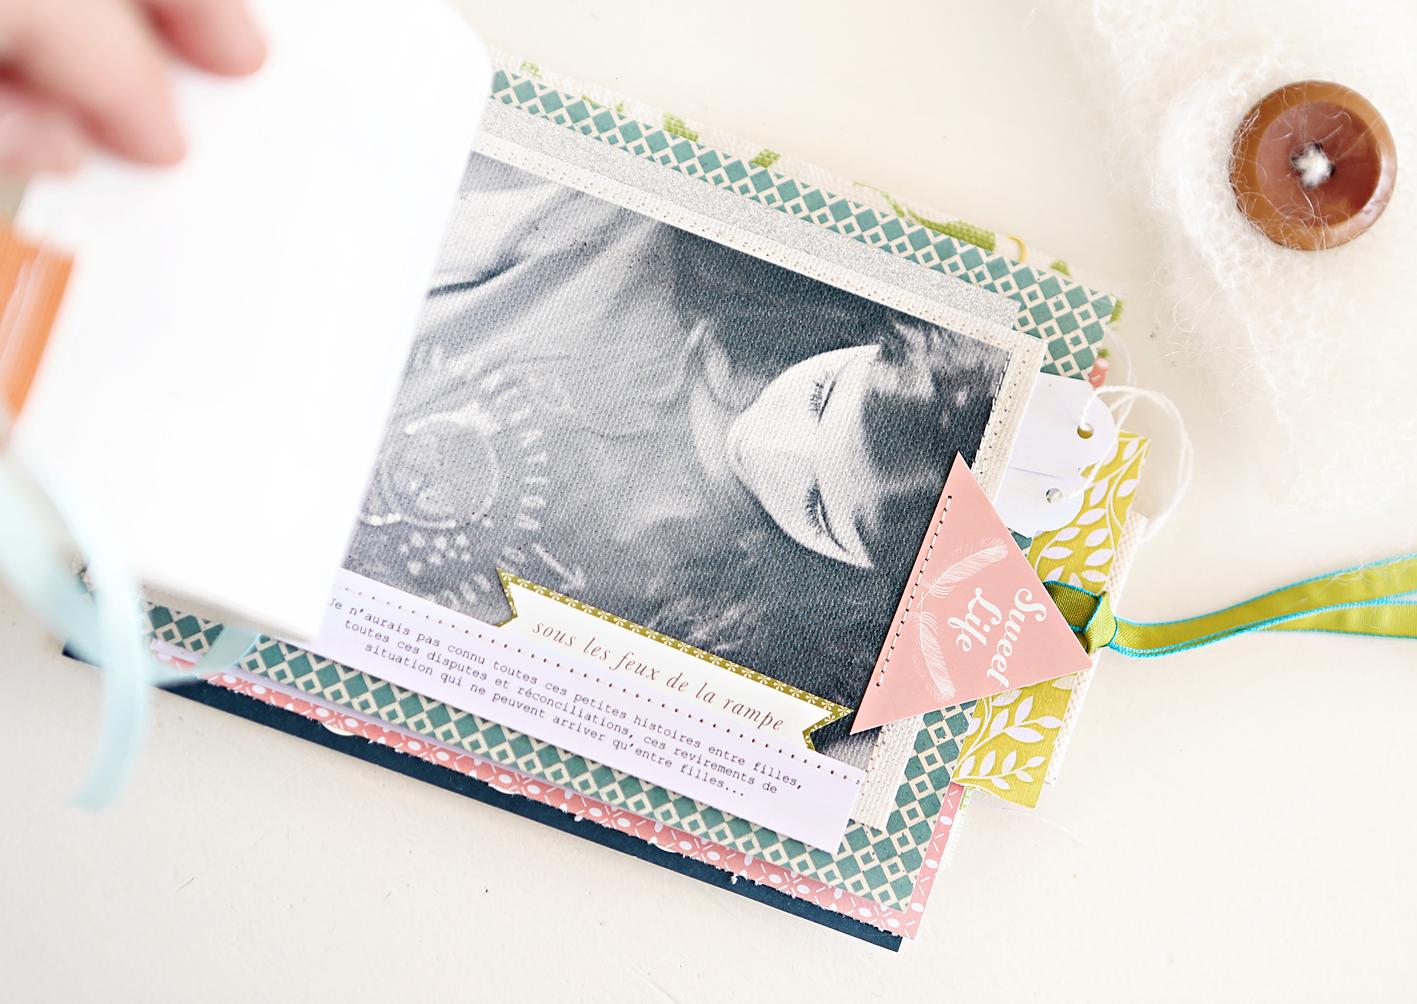 kesi-art-imprimer-sur-du-tissus-stephanie-dagan-scrapbooking-6